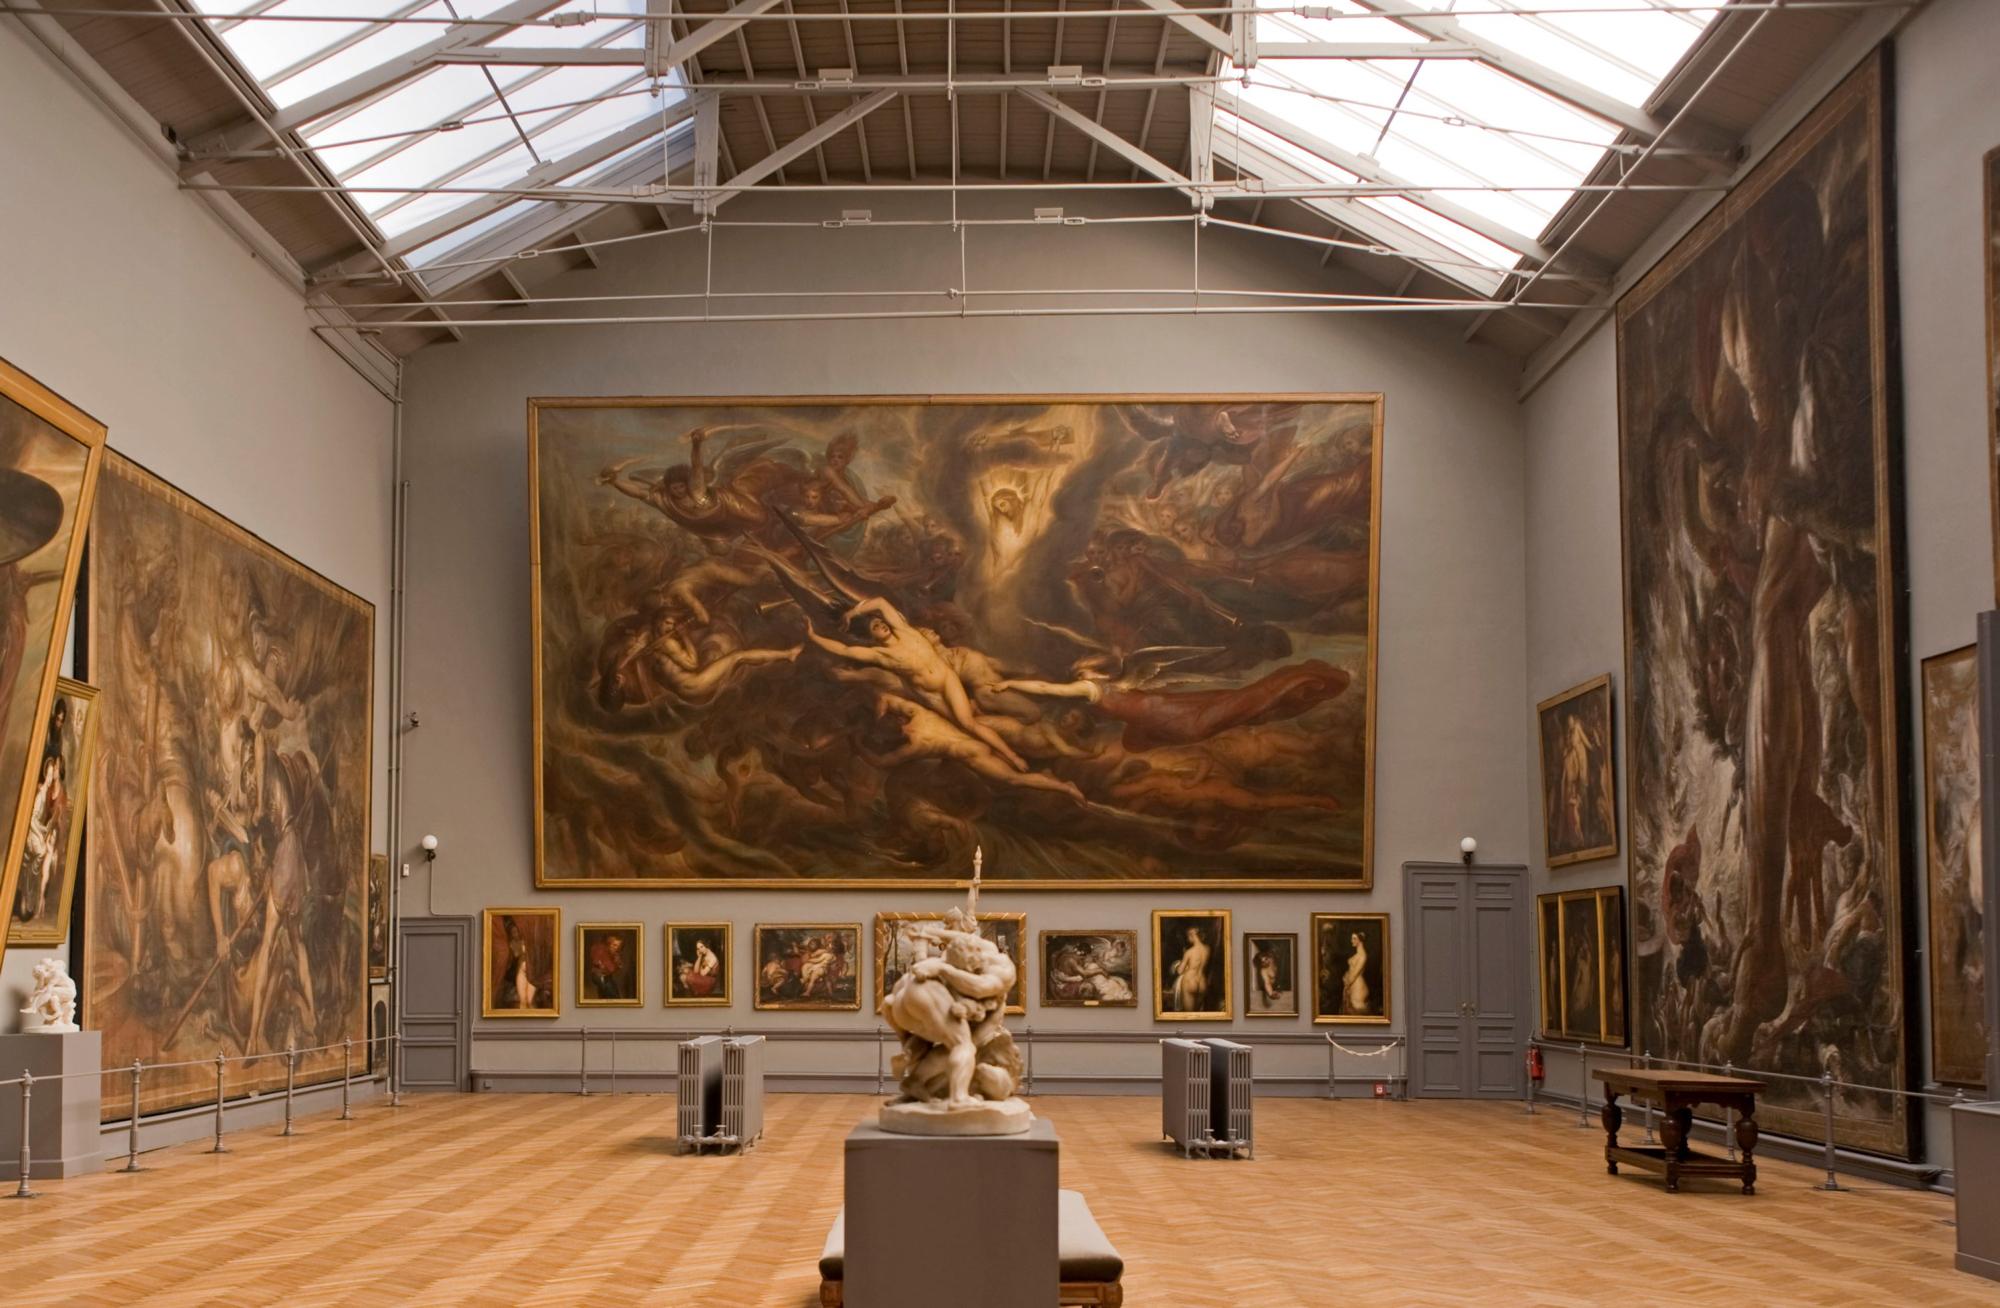 D Art Exhibition Jbr : Royal museums of fine arts belgium brussels